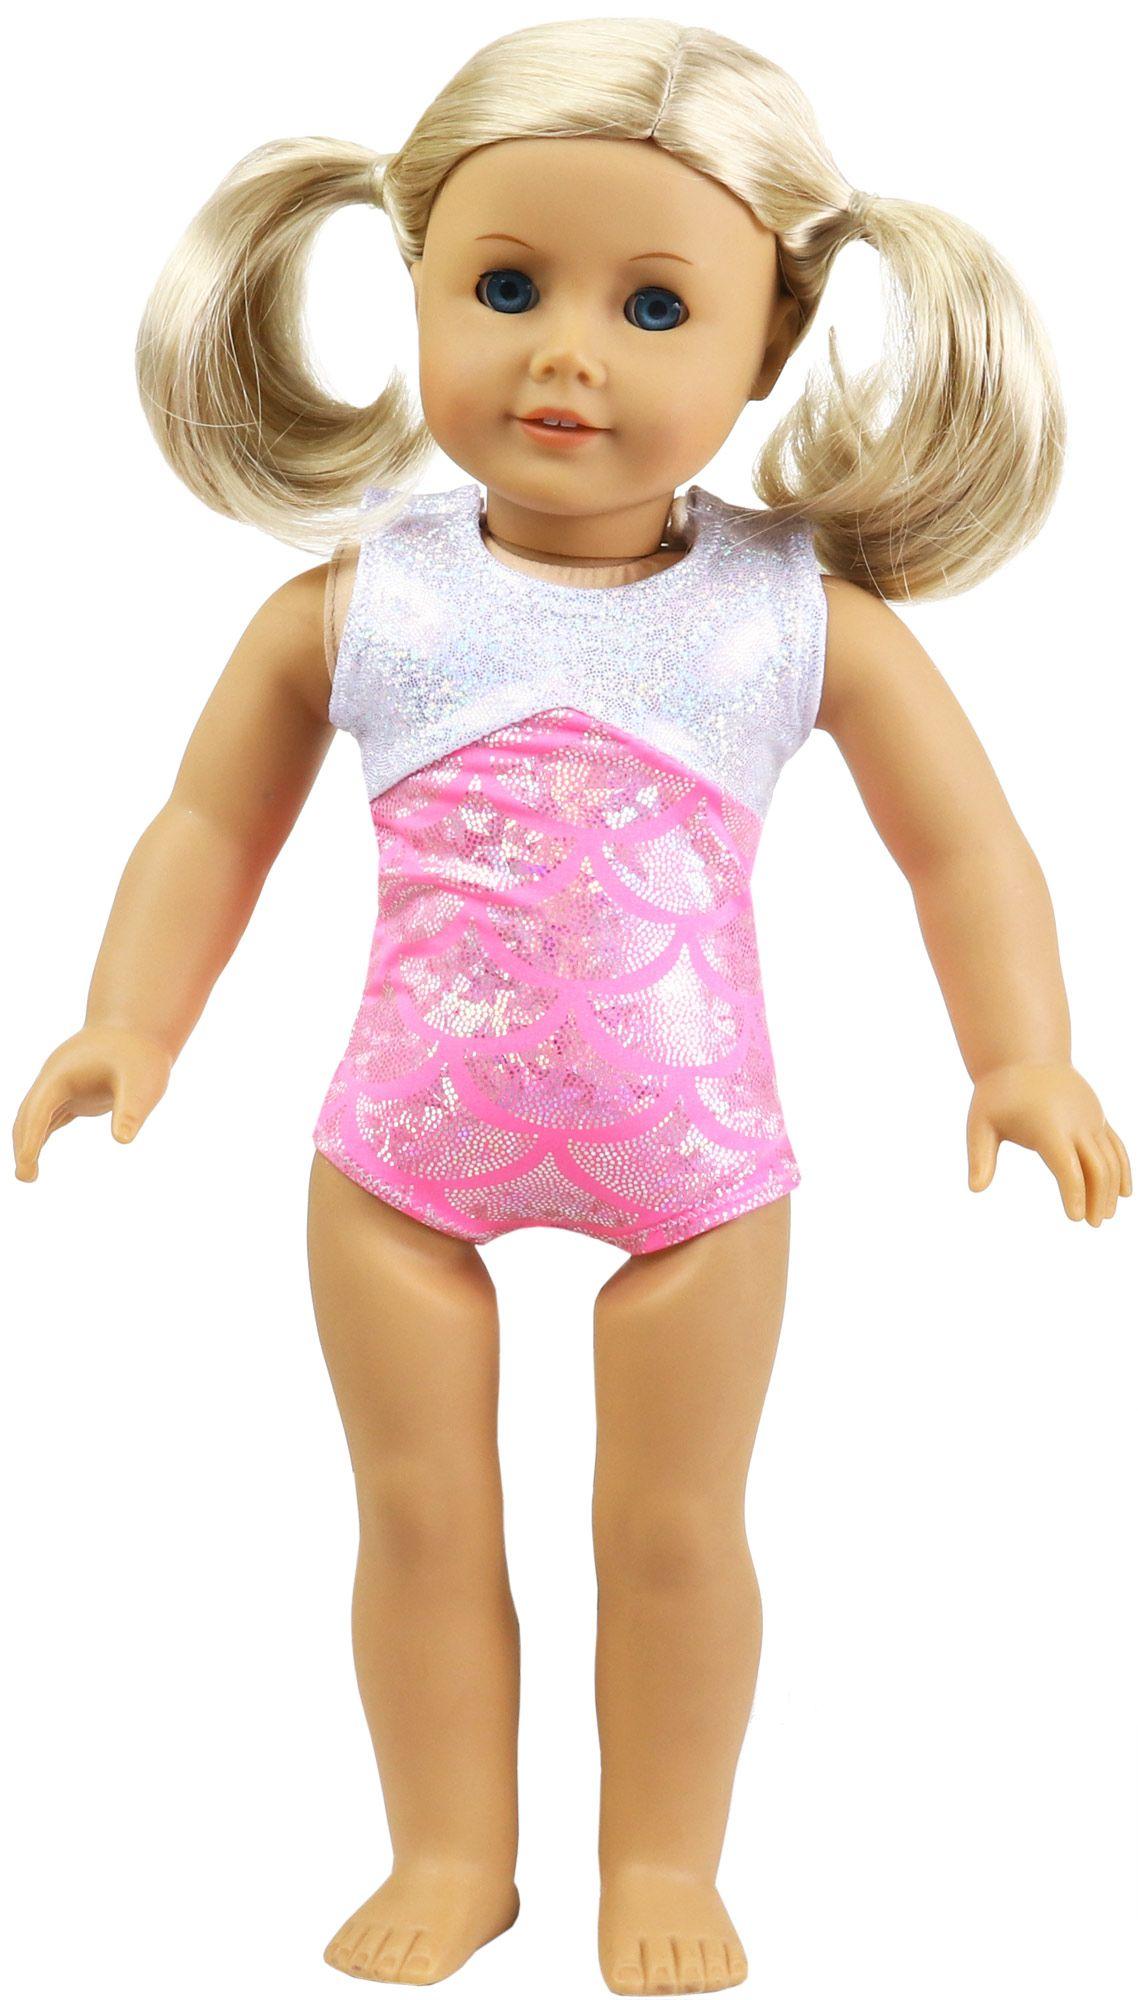 c0c5363a5b44 Splash Matching Doll Leotard - Pink